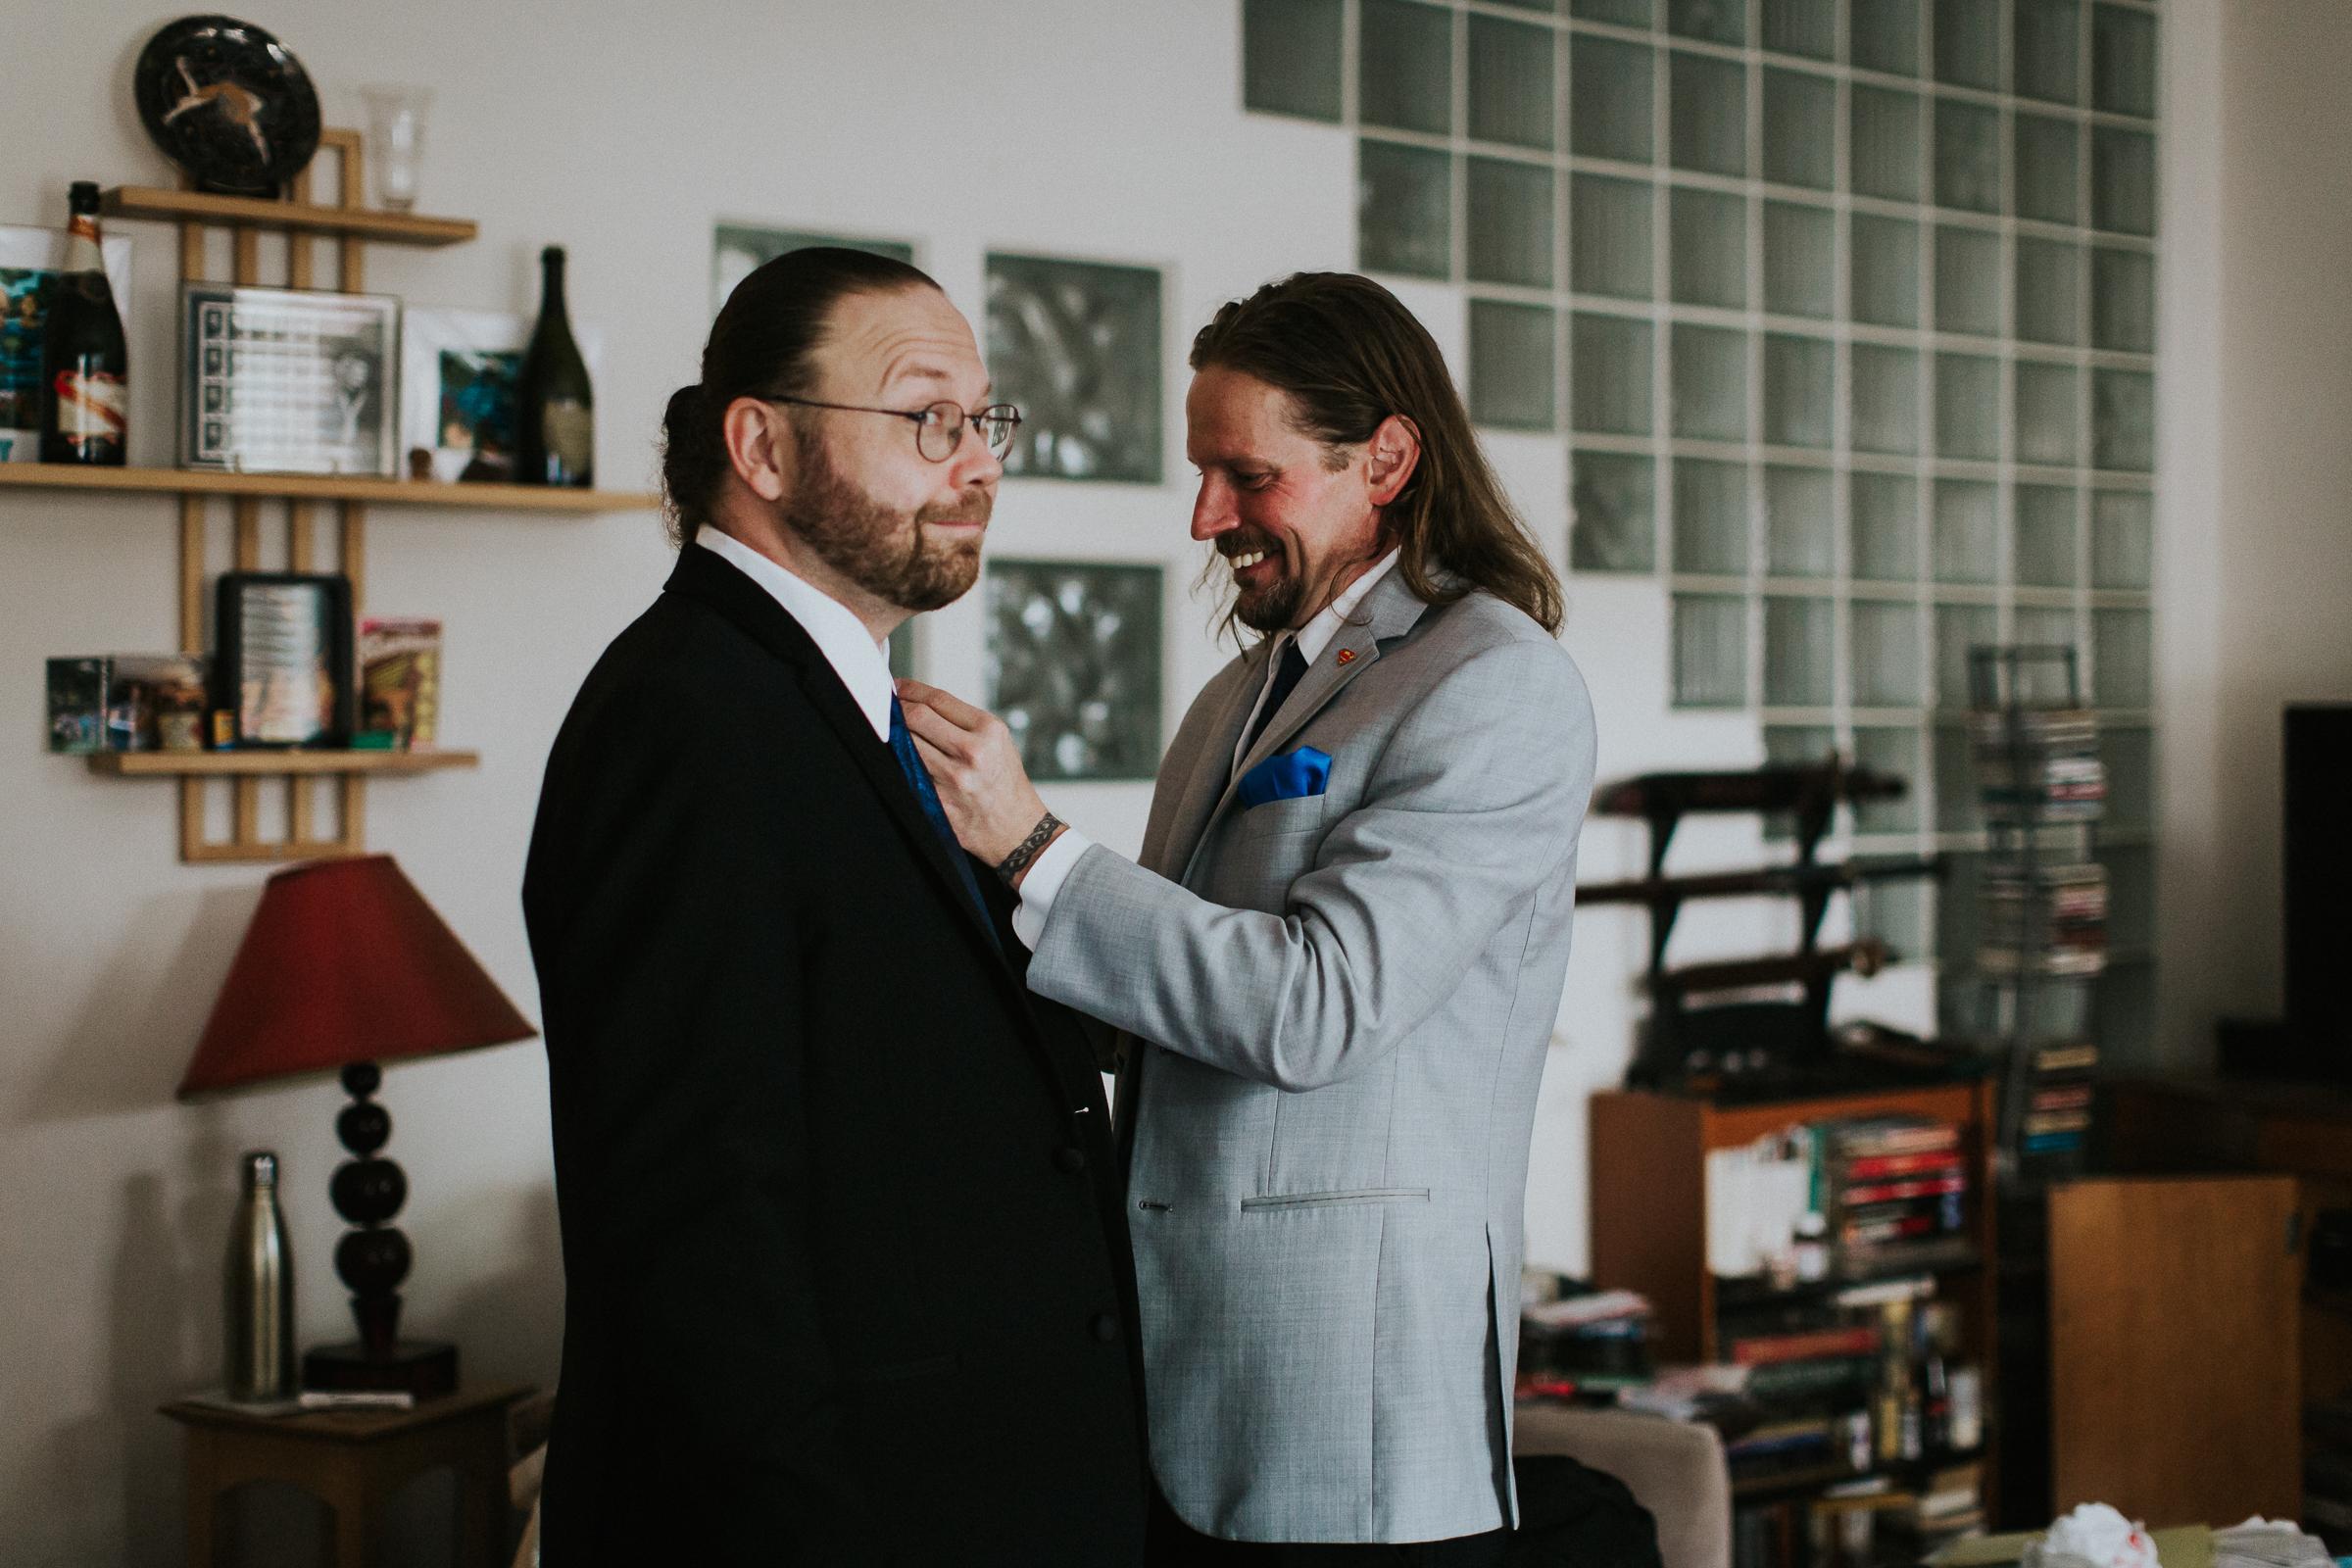 NYC-Brooklyn-Hotel-1-Botanic-Garden-Documentary-Wedding-Photographer-2.jpg